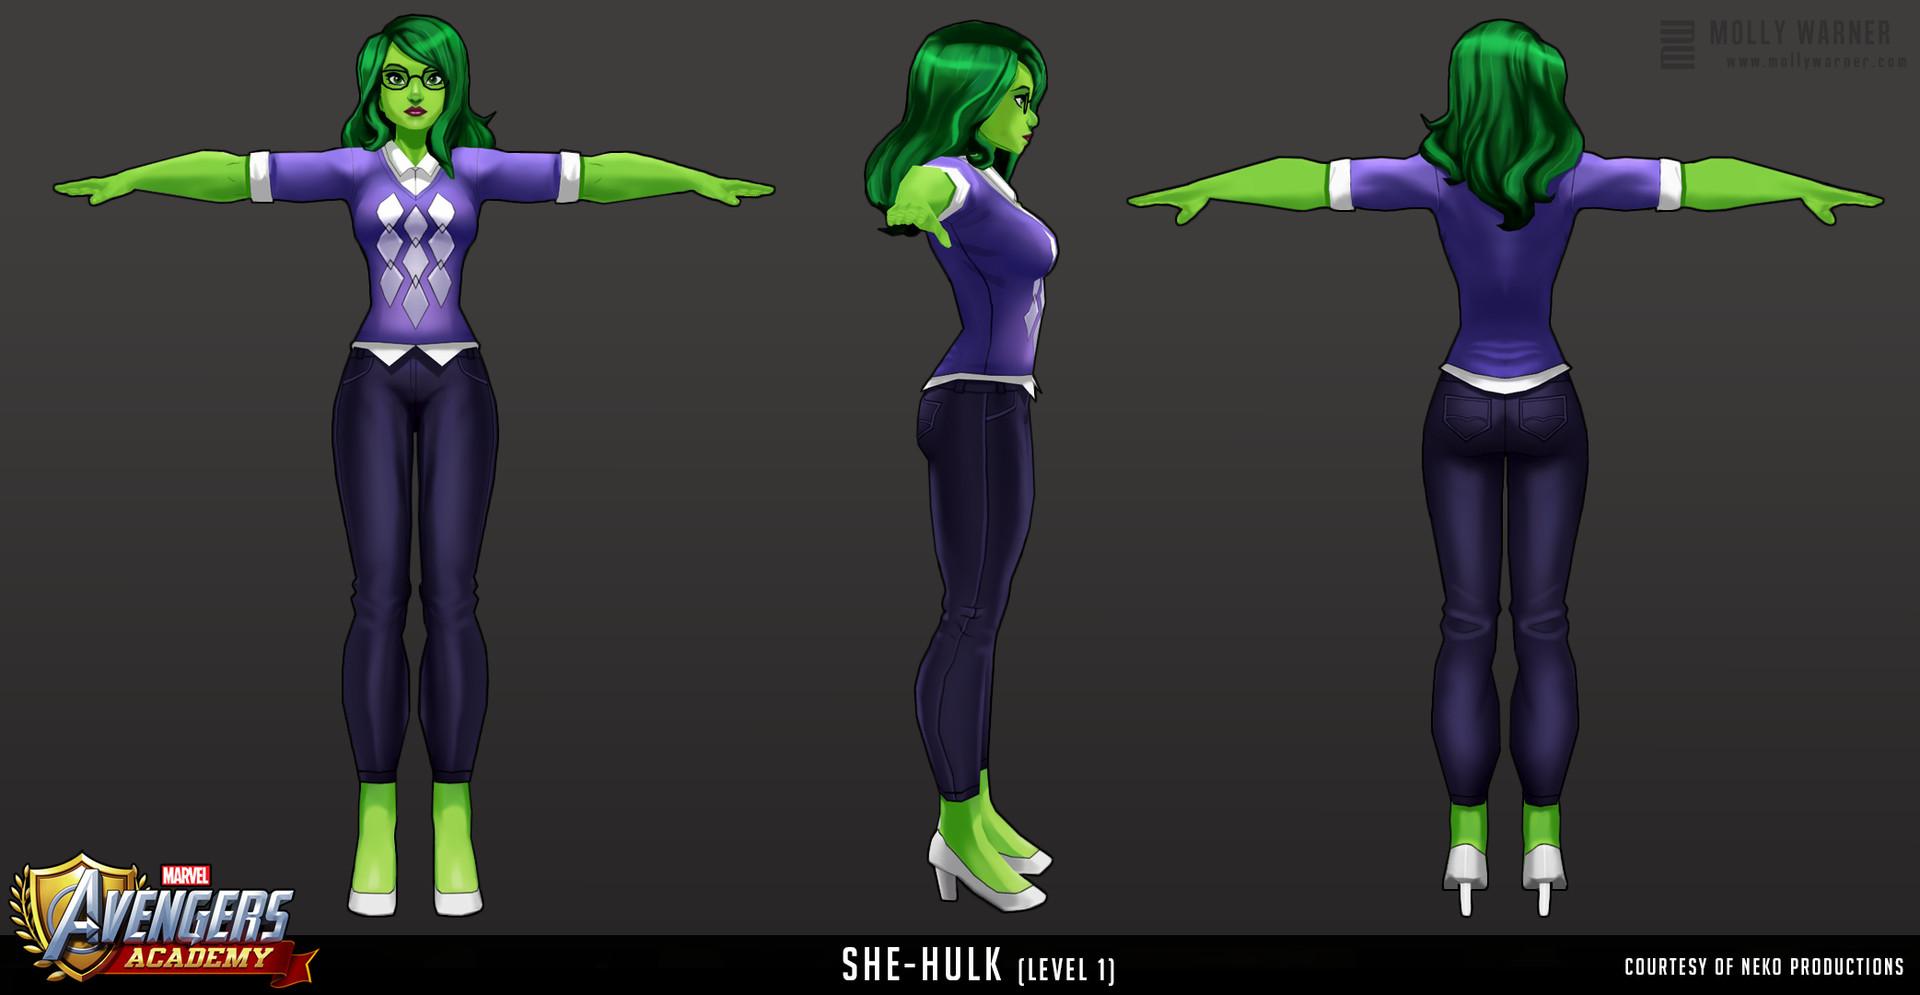 Molly warner 19 avengers academy she hulk l1